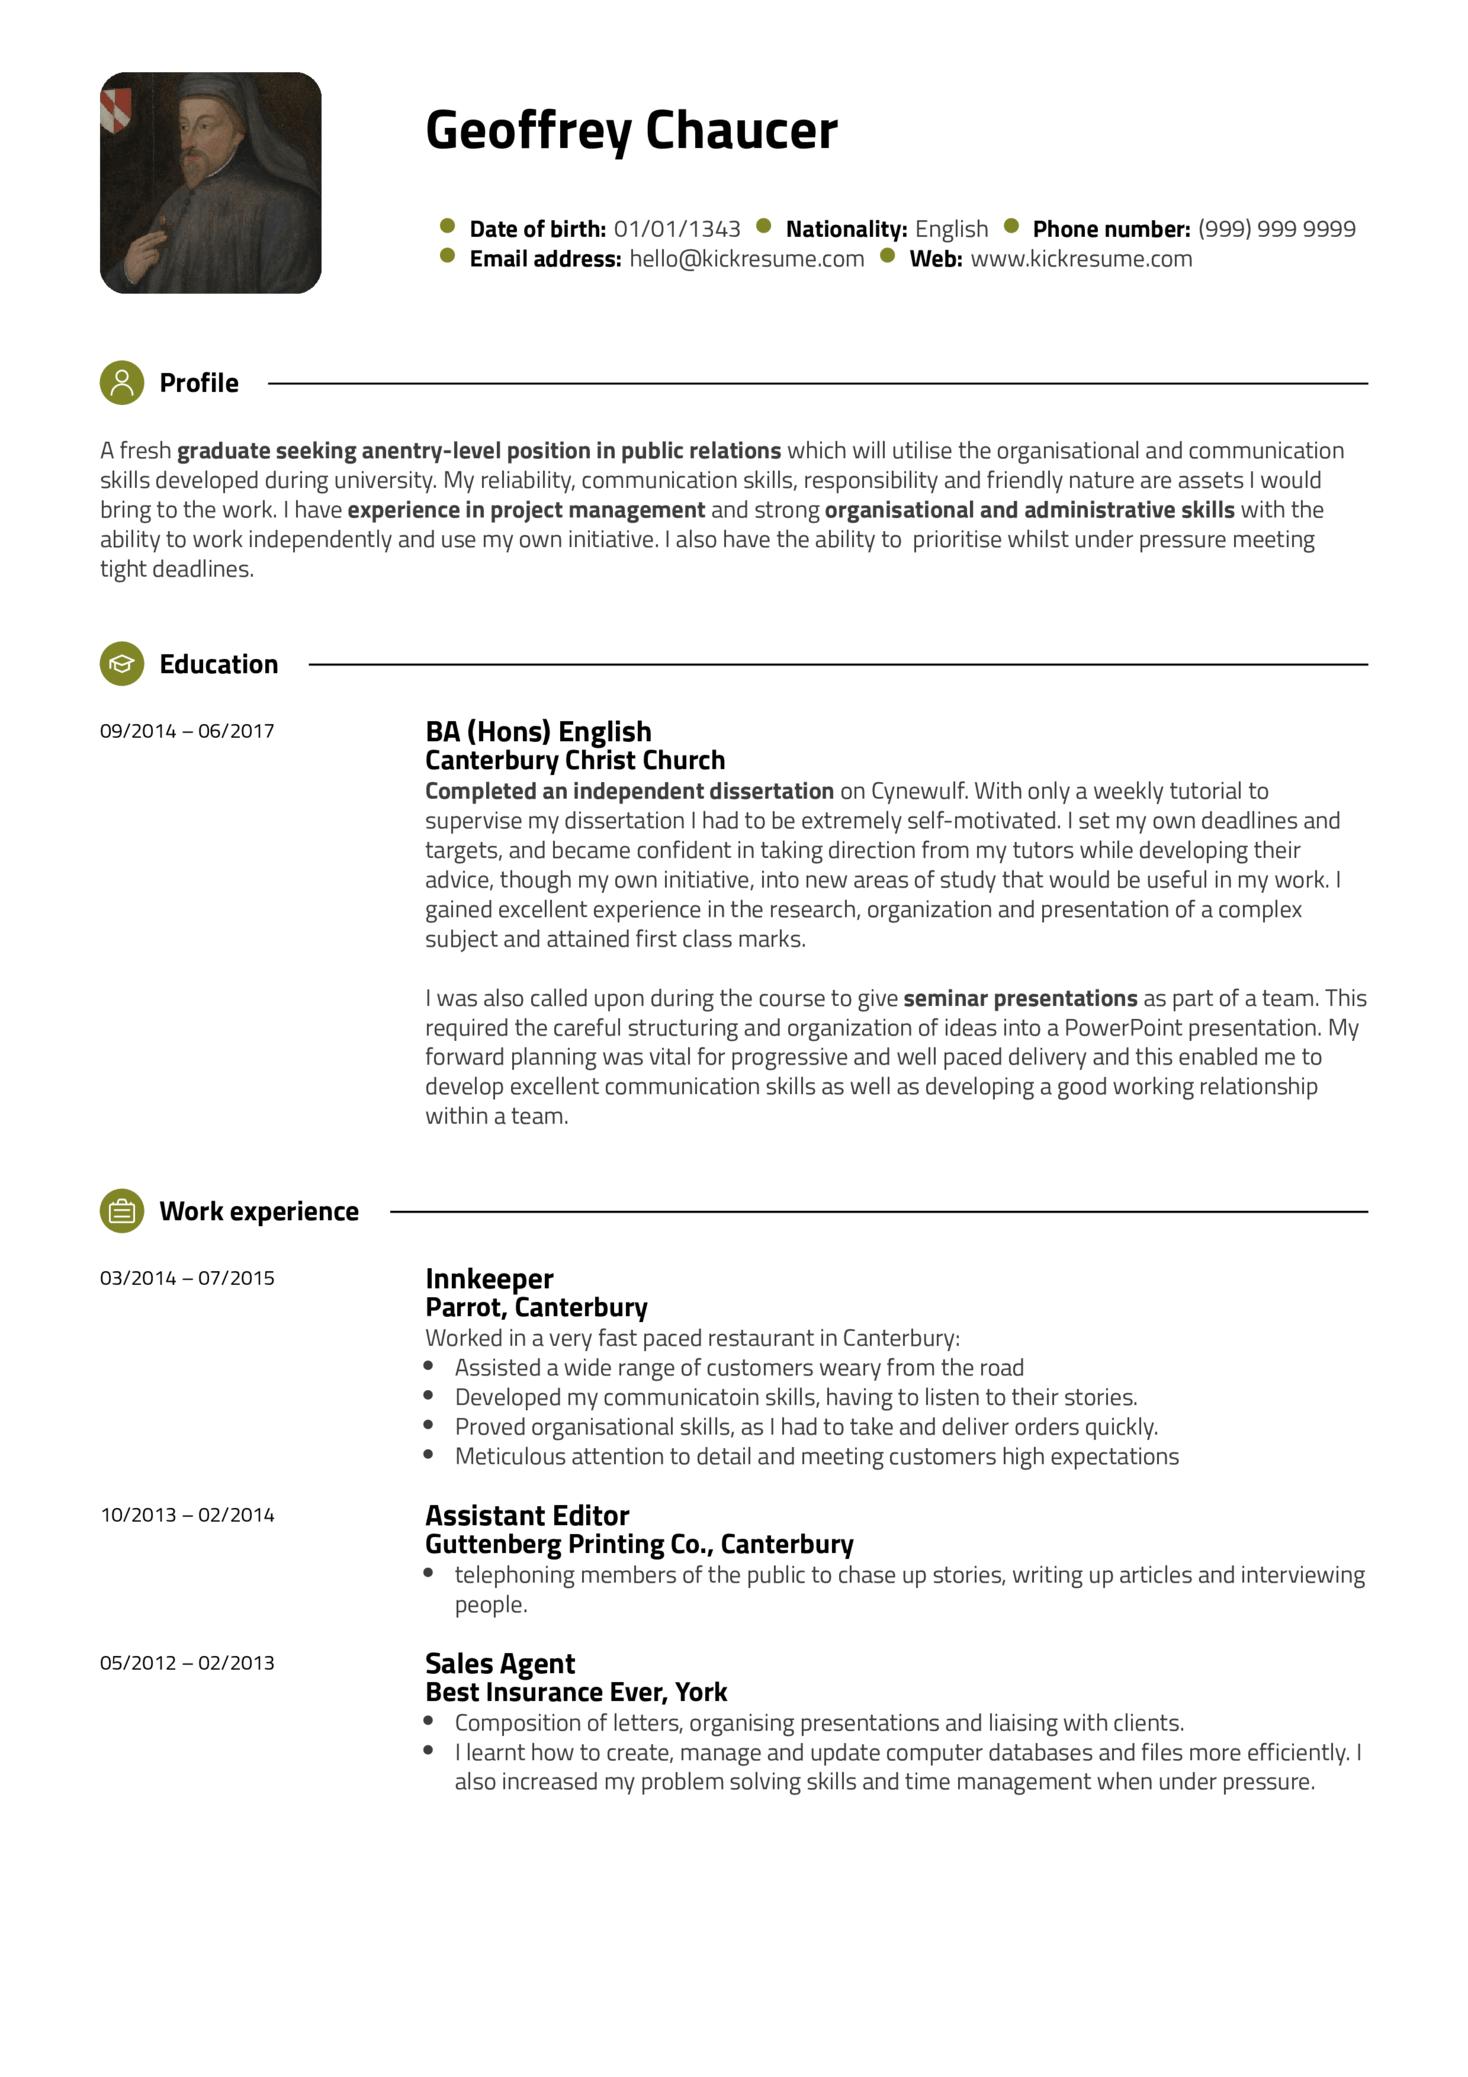 Student Resume Sample Public Relations (Part 1)